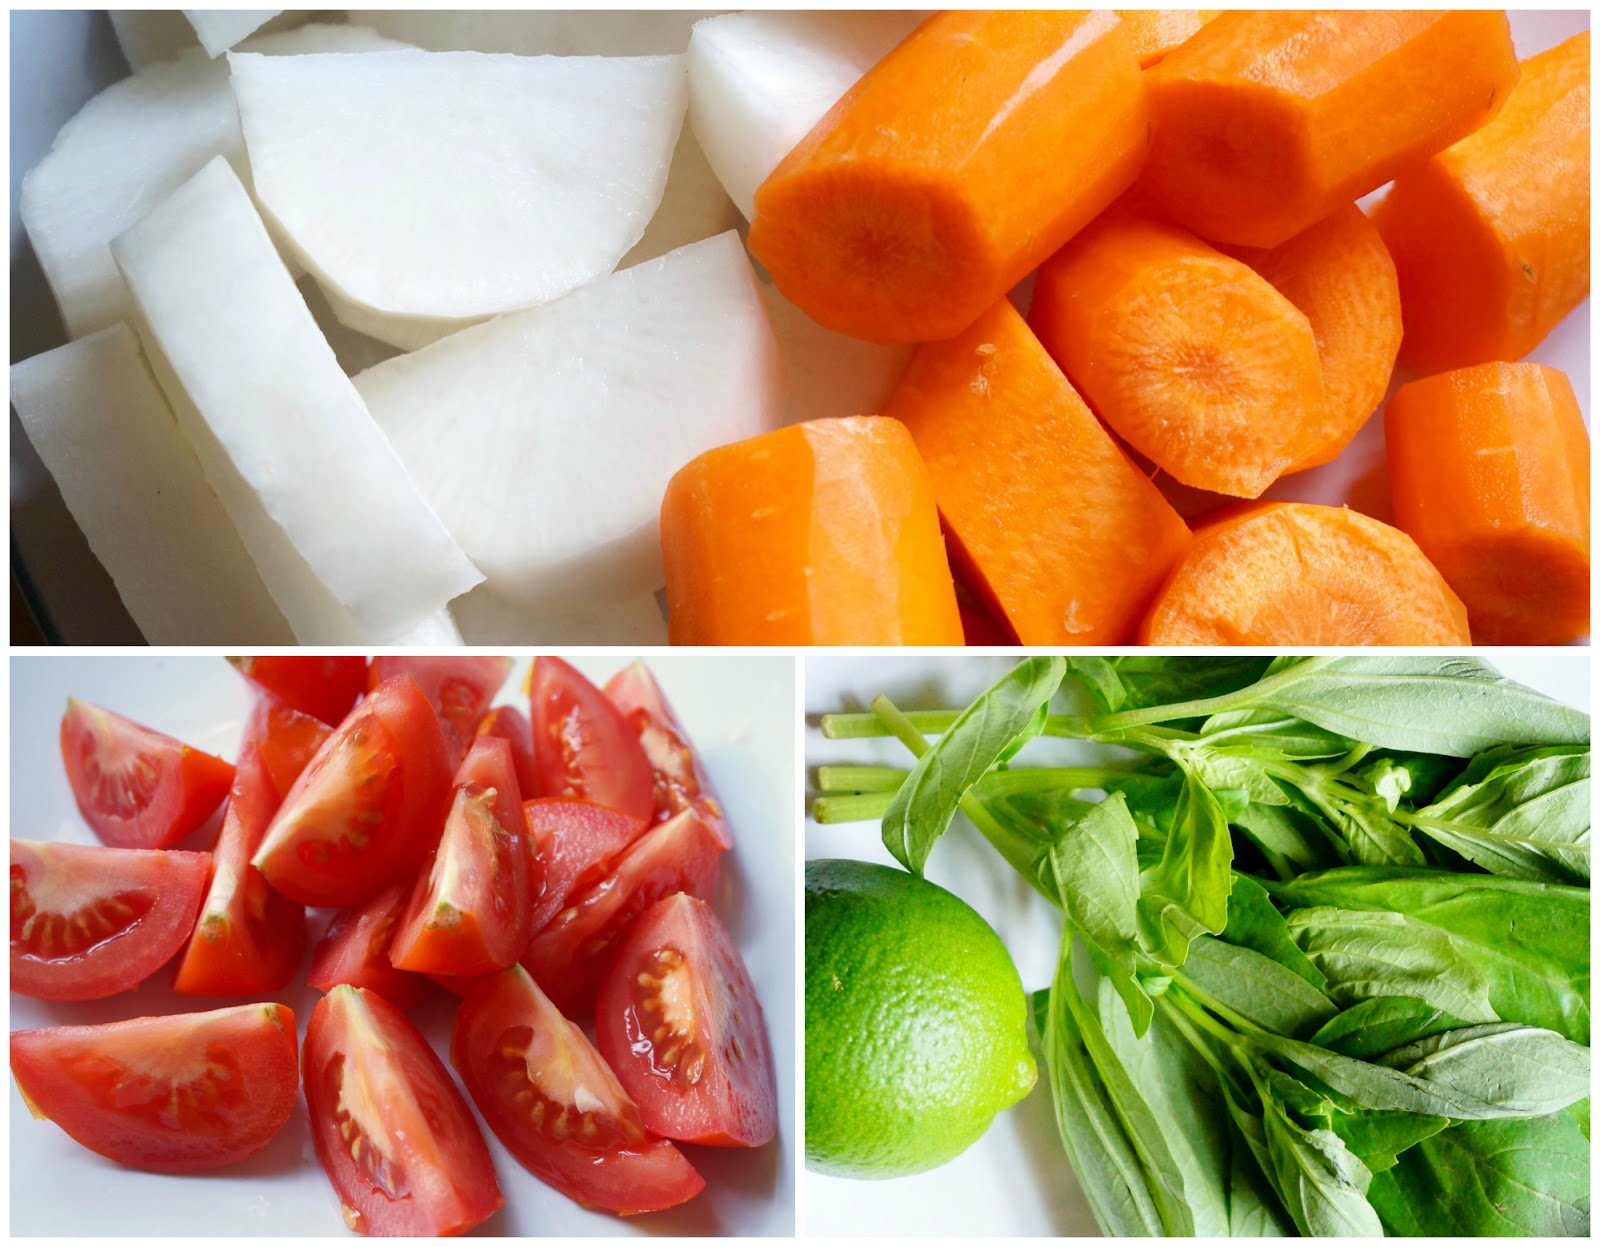 Beef Brisket & White Radish Recipe